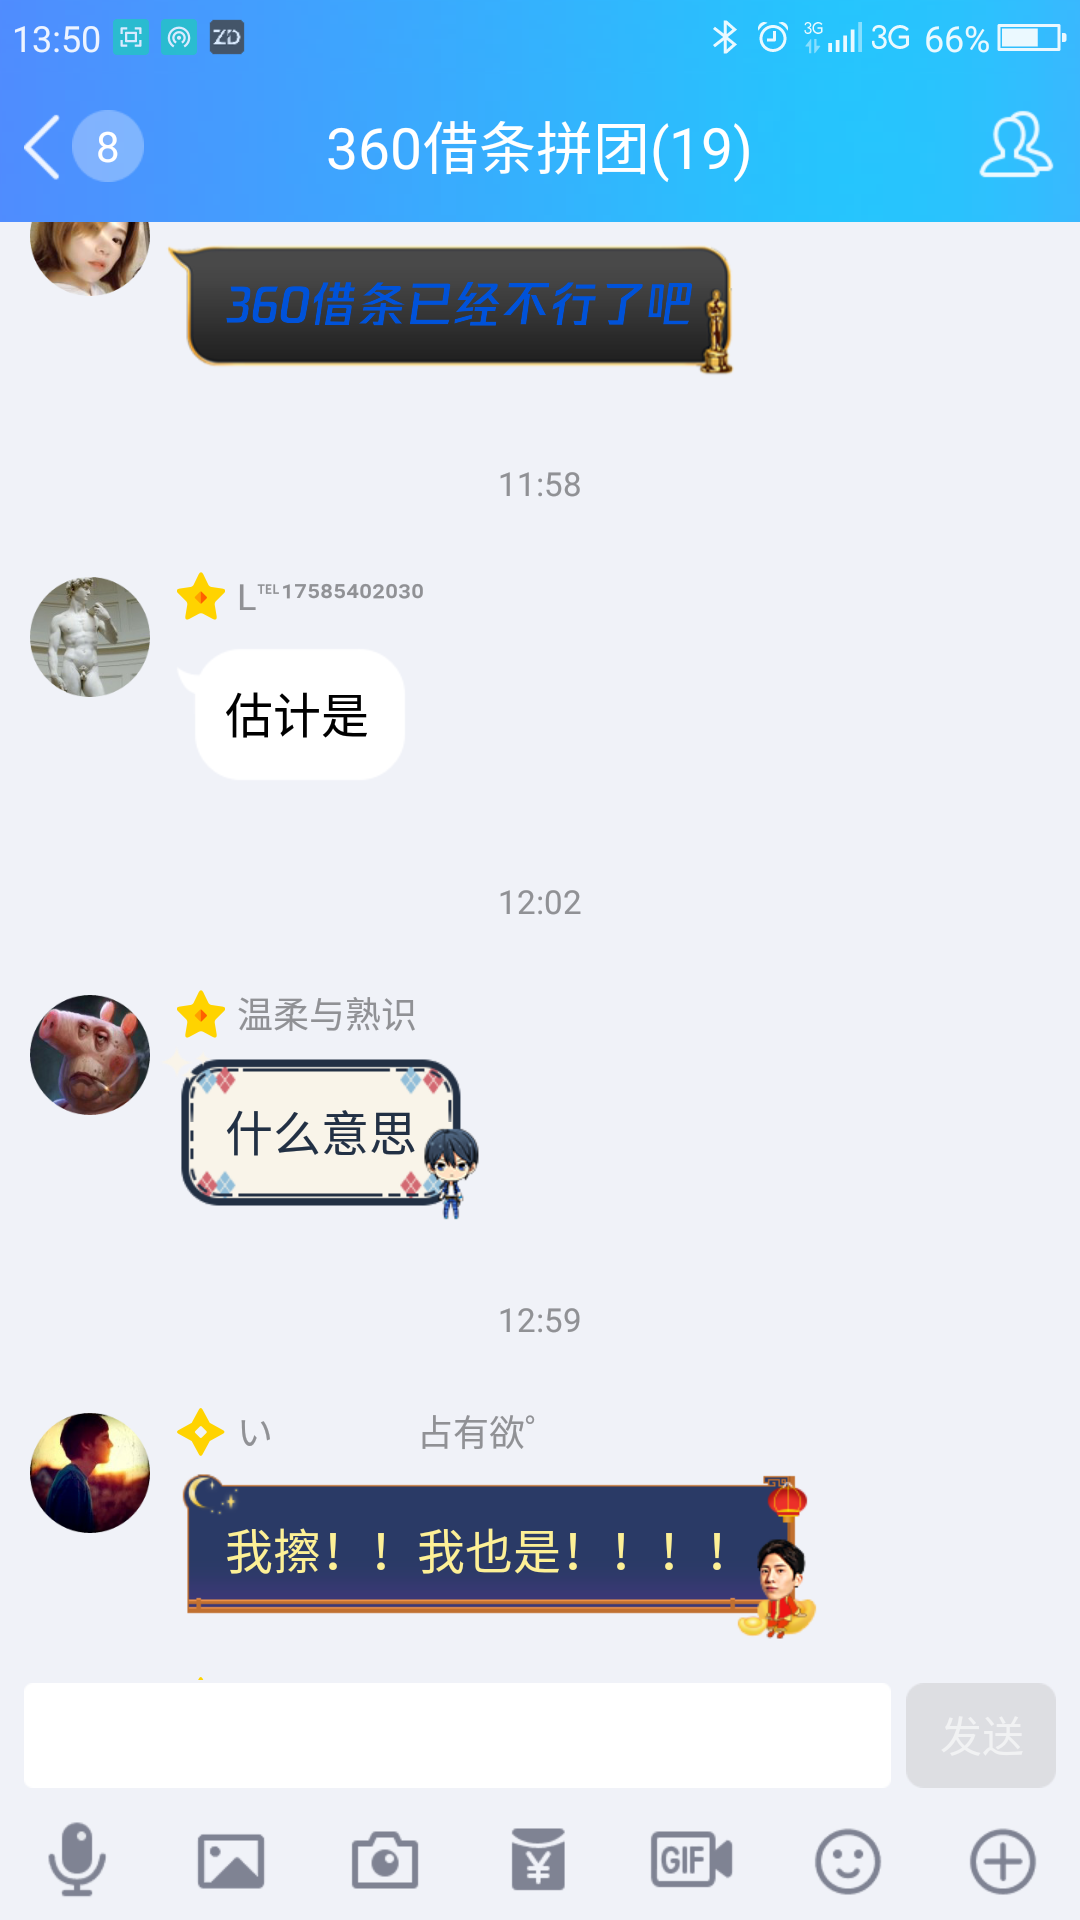 Screenshot_2019-01-10-13-50-55.png